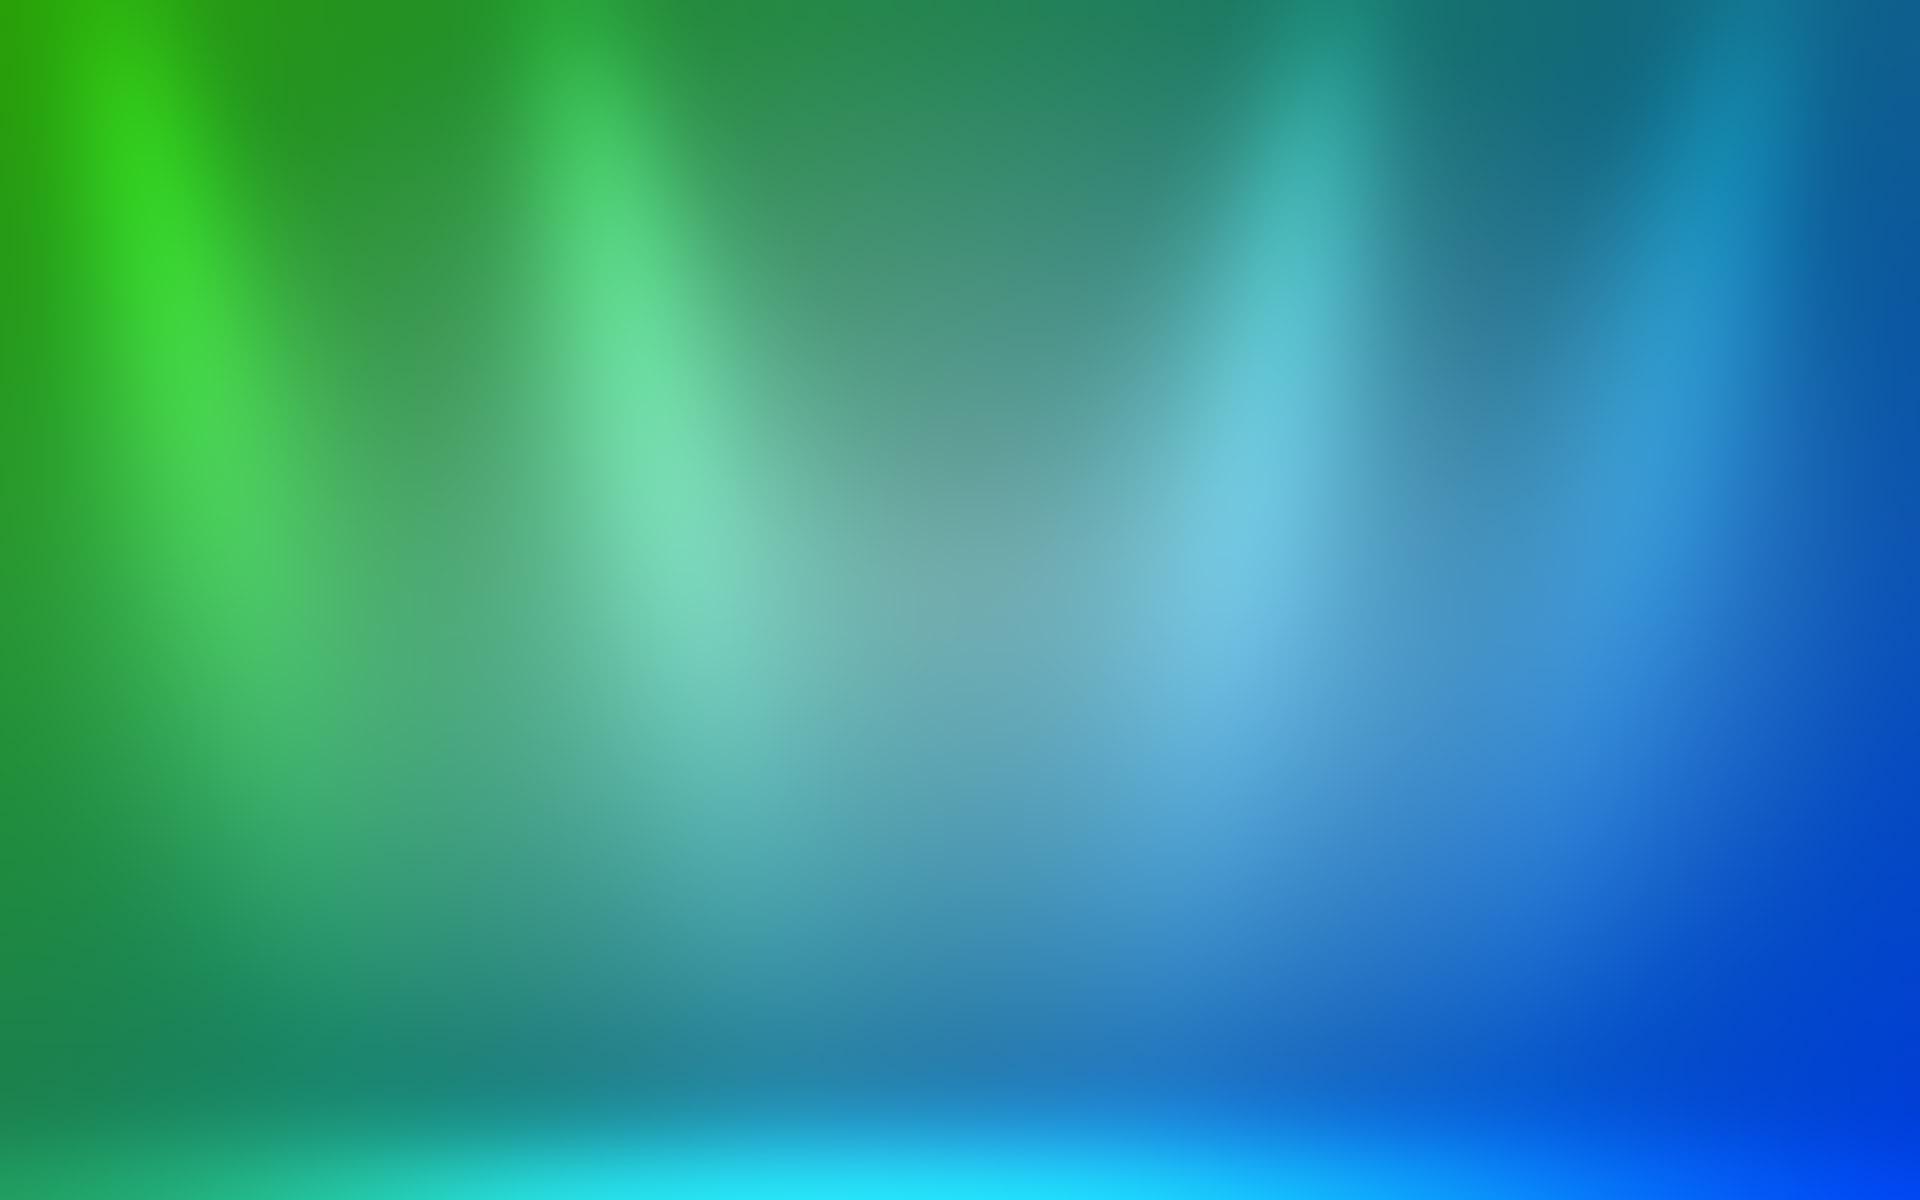 Light blue green wallpaper 72 images 1920x1200 green blue background wallpaper 1189207 aloadofball Image collections